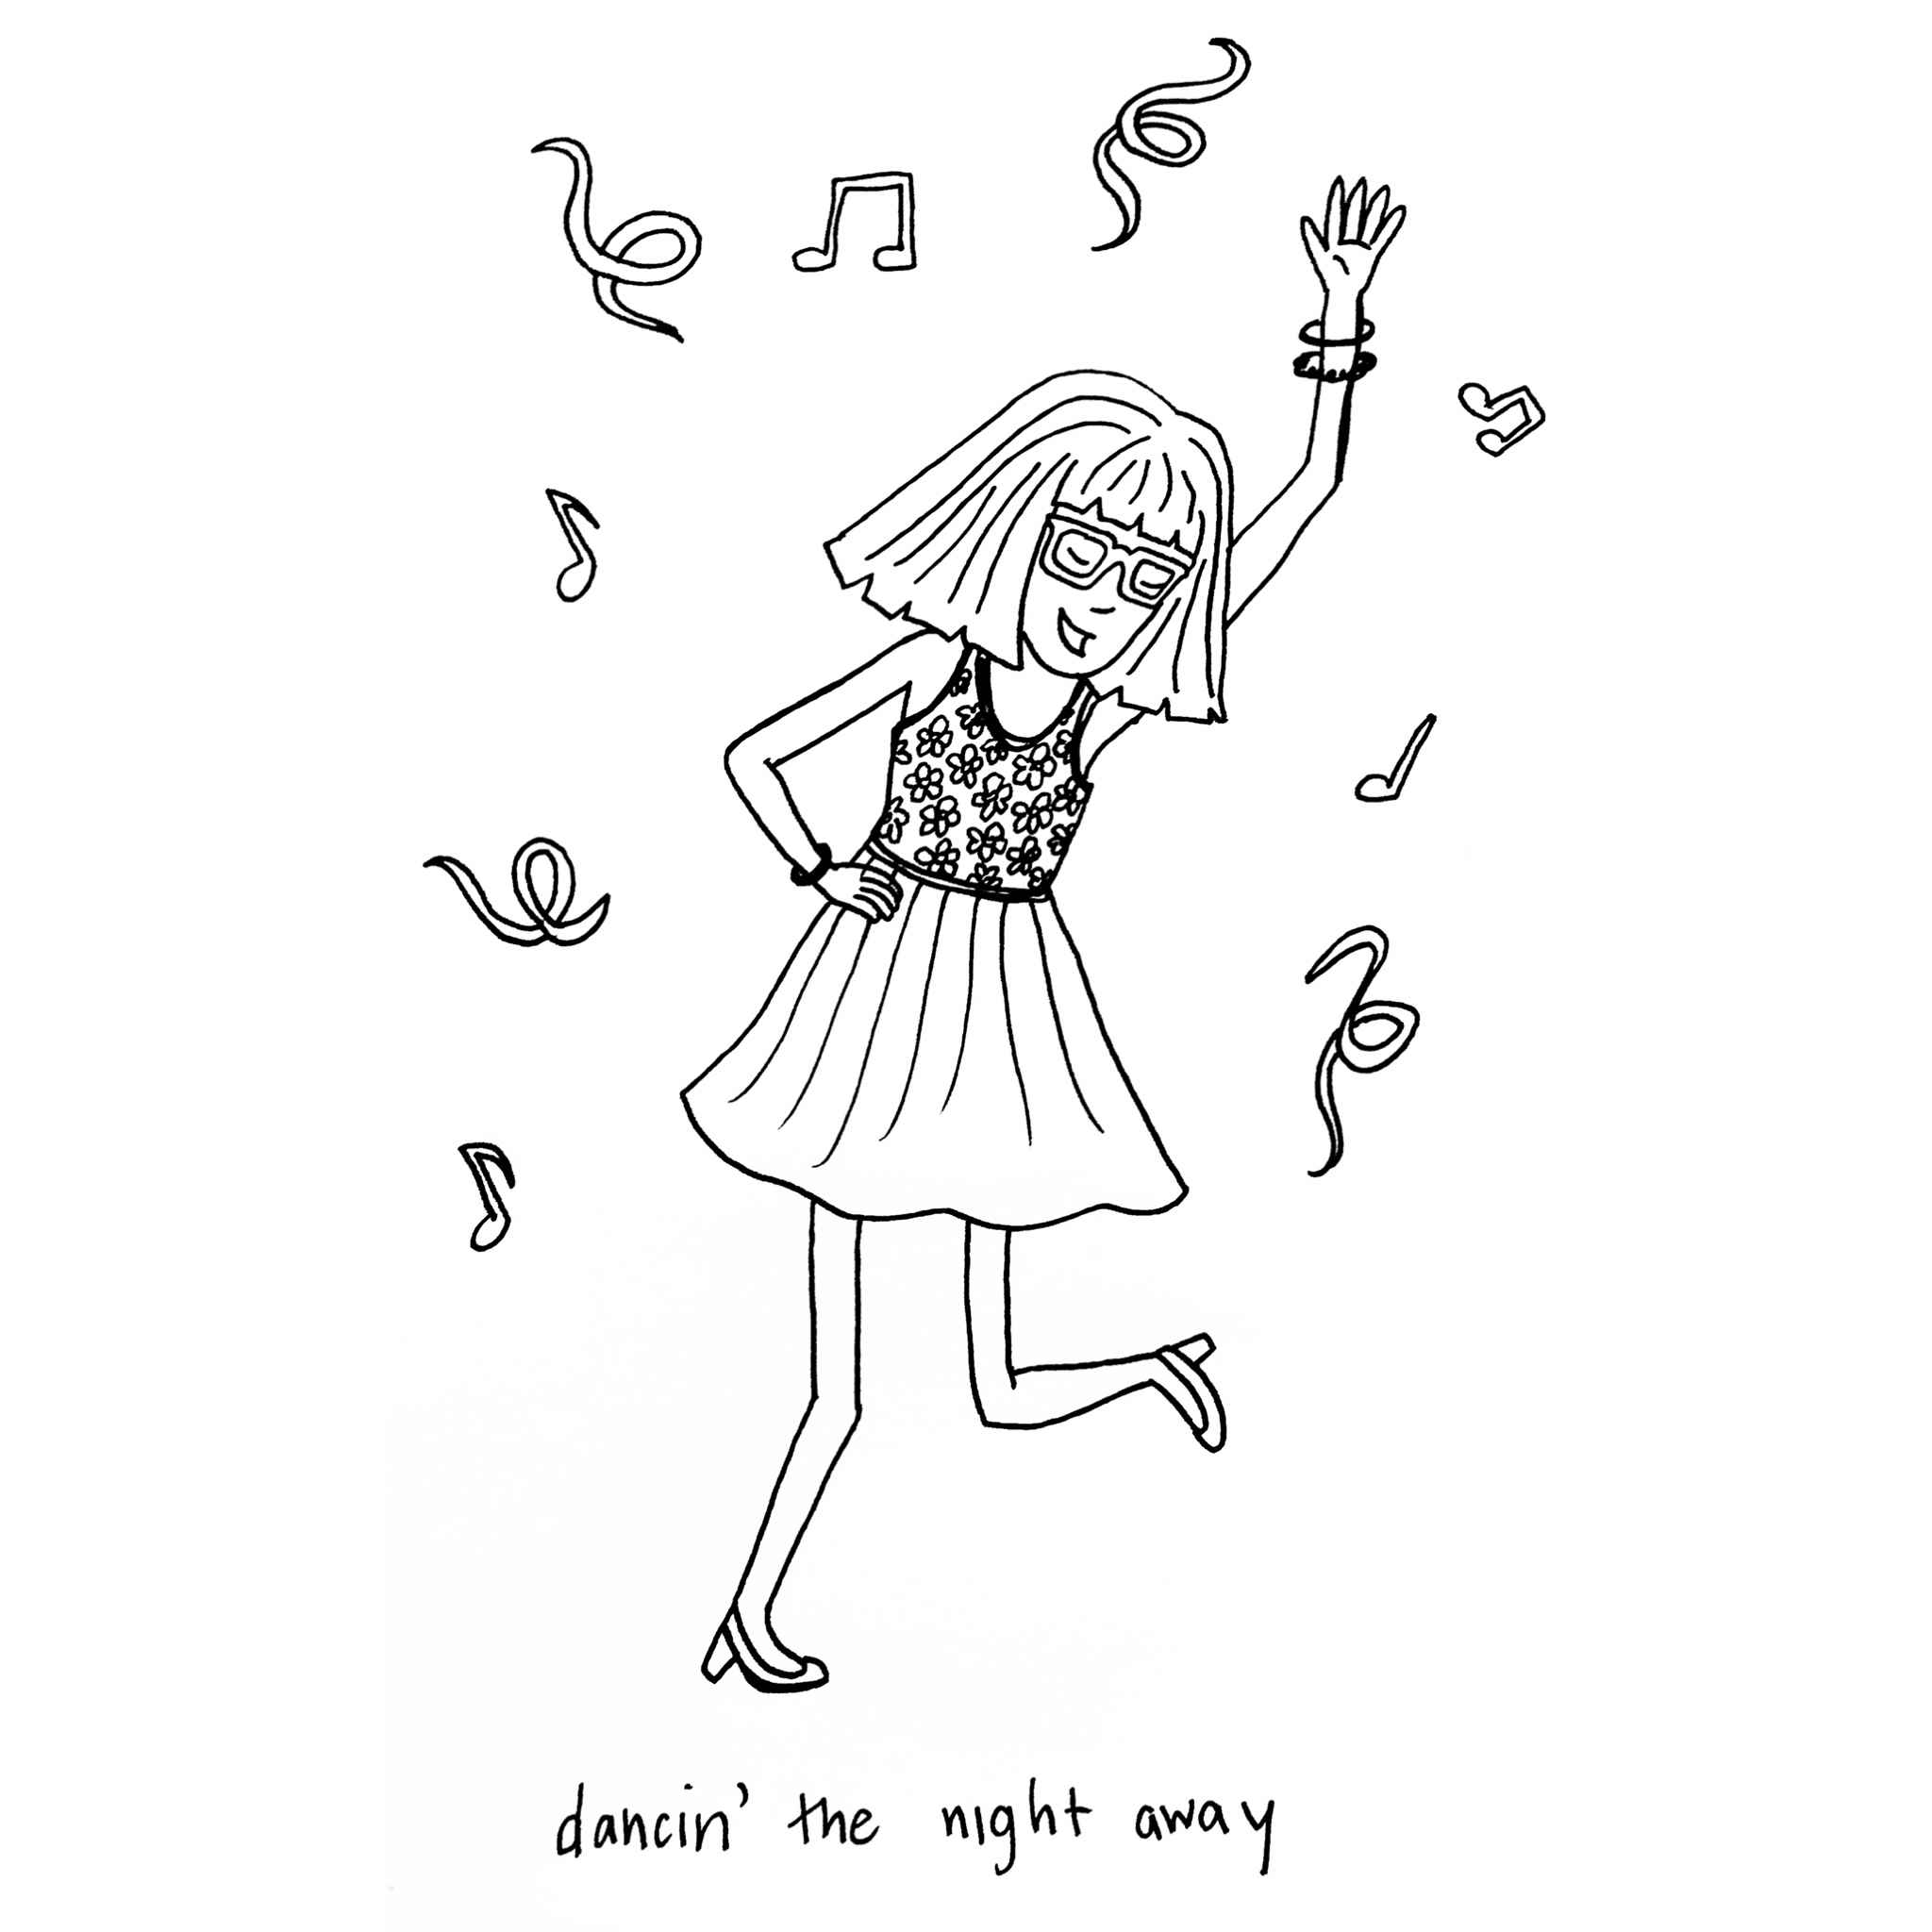 036_lucy-chen_dancin-the-night-away.PNG